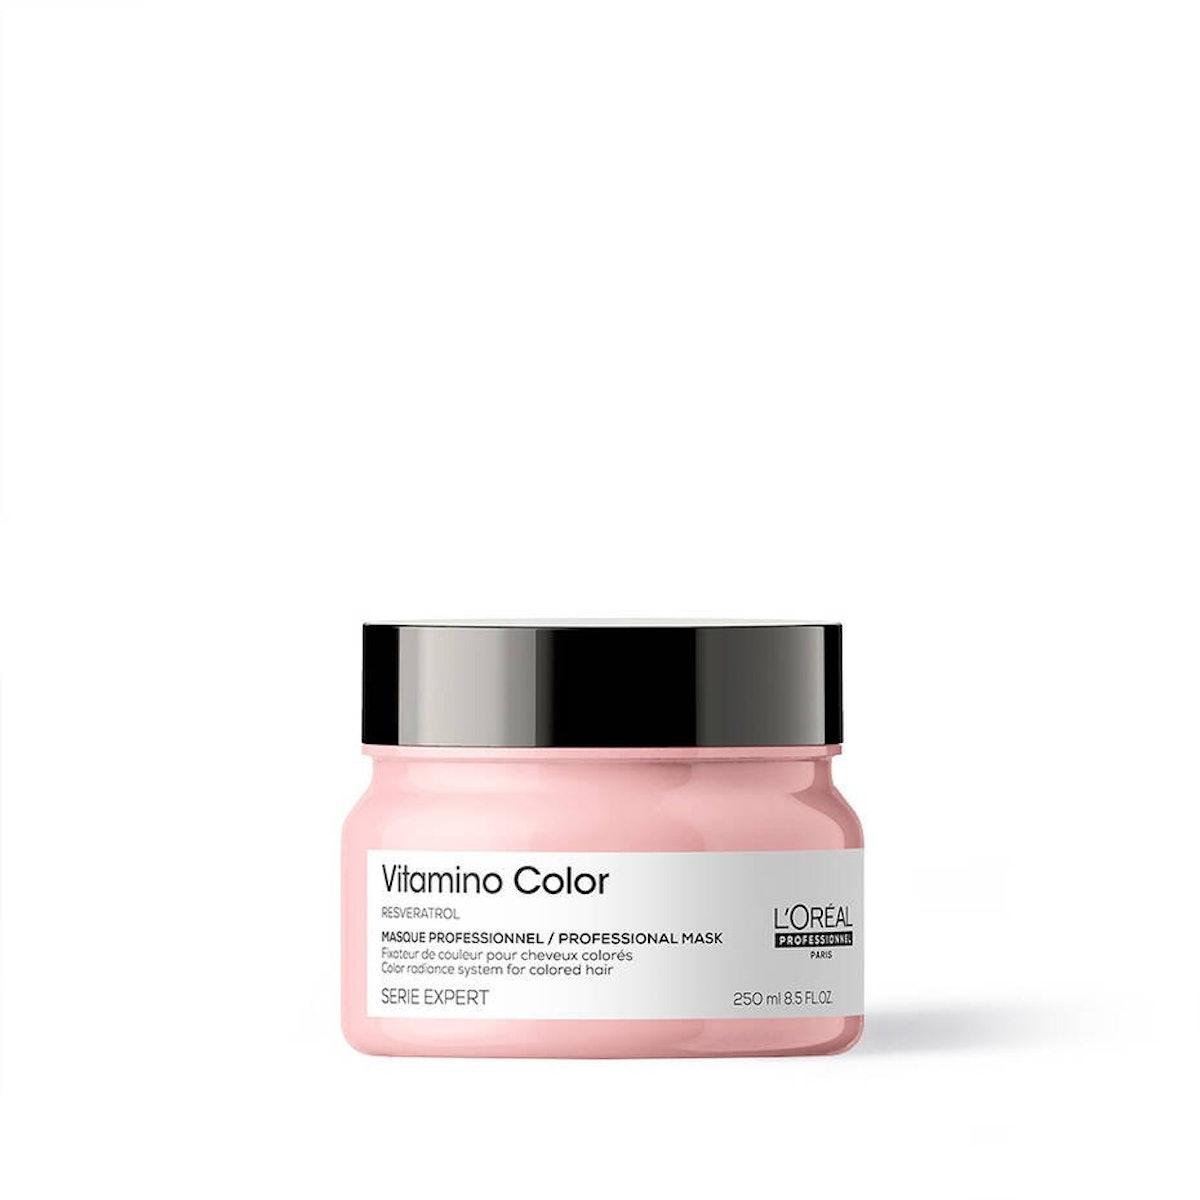 Serie Expert Vitamino Color Mask